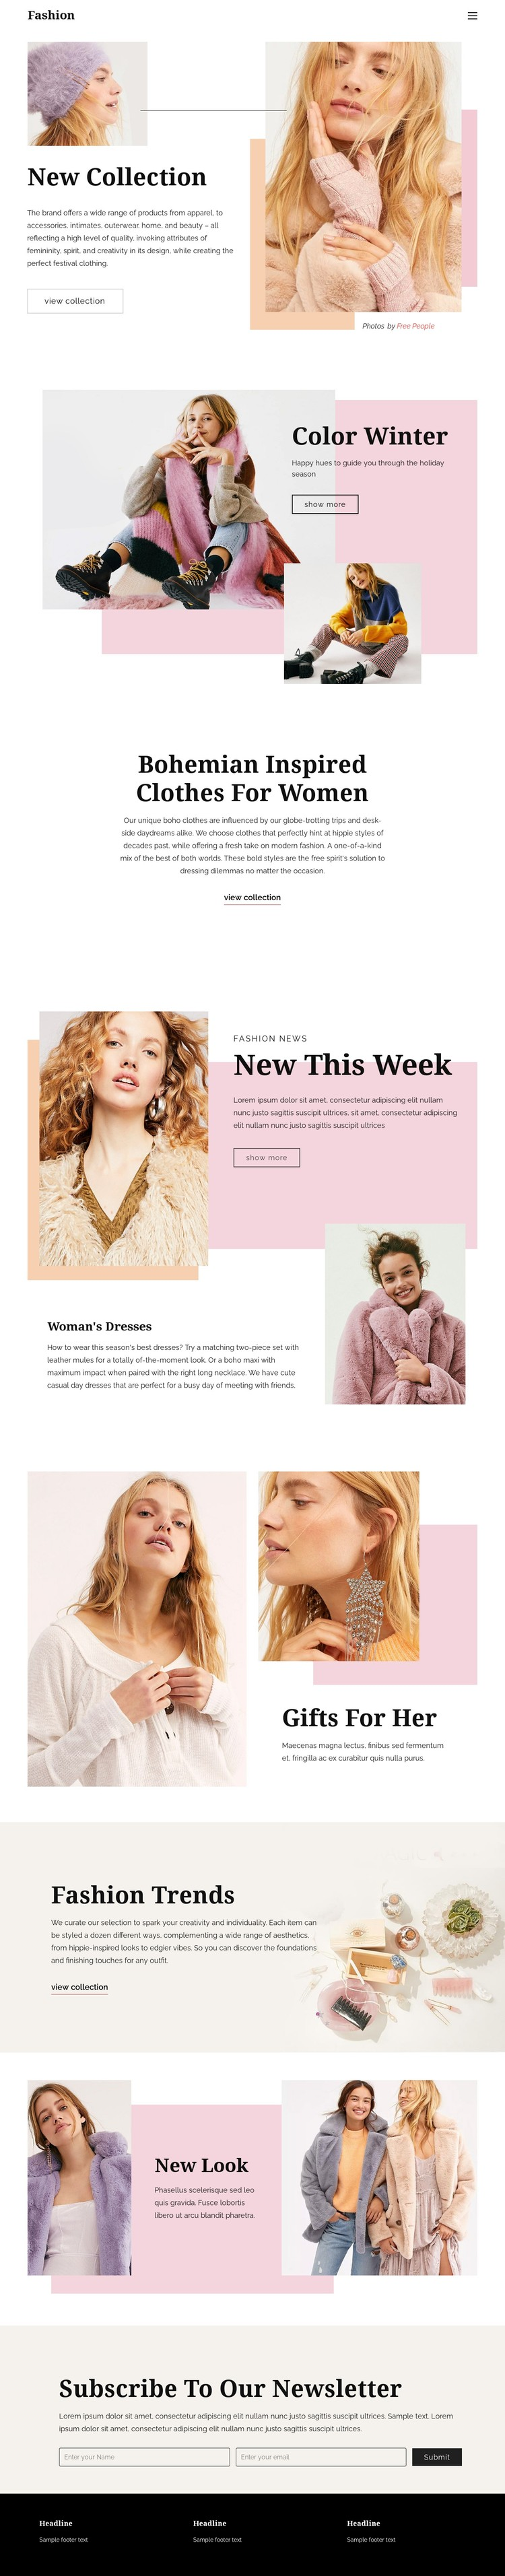 Fashion Page Design Website Creator